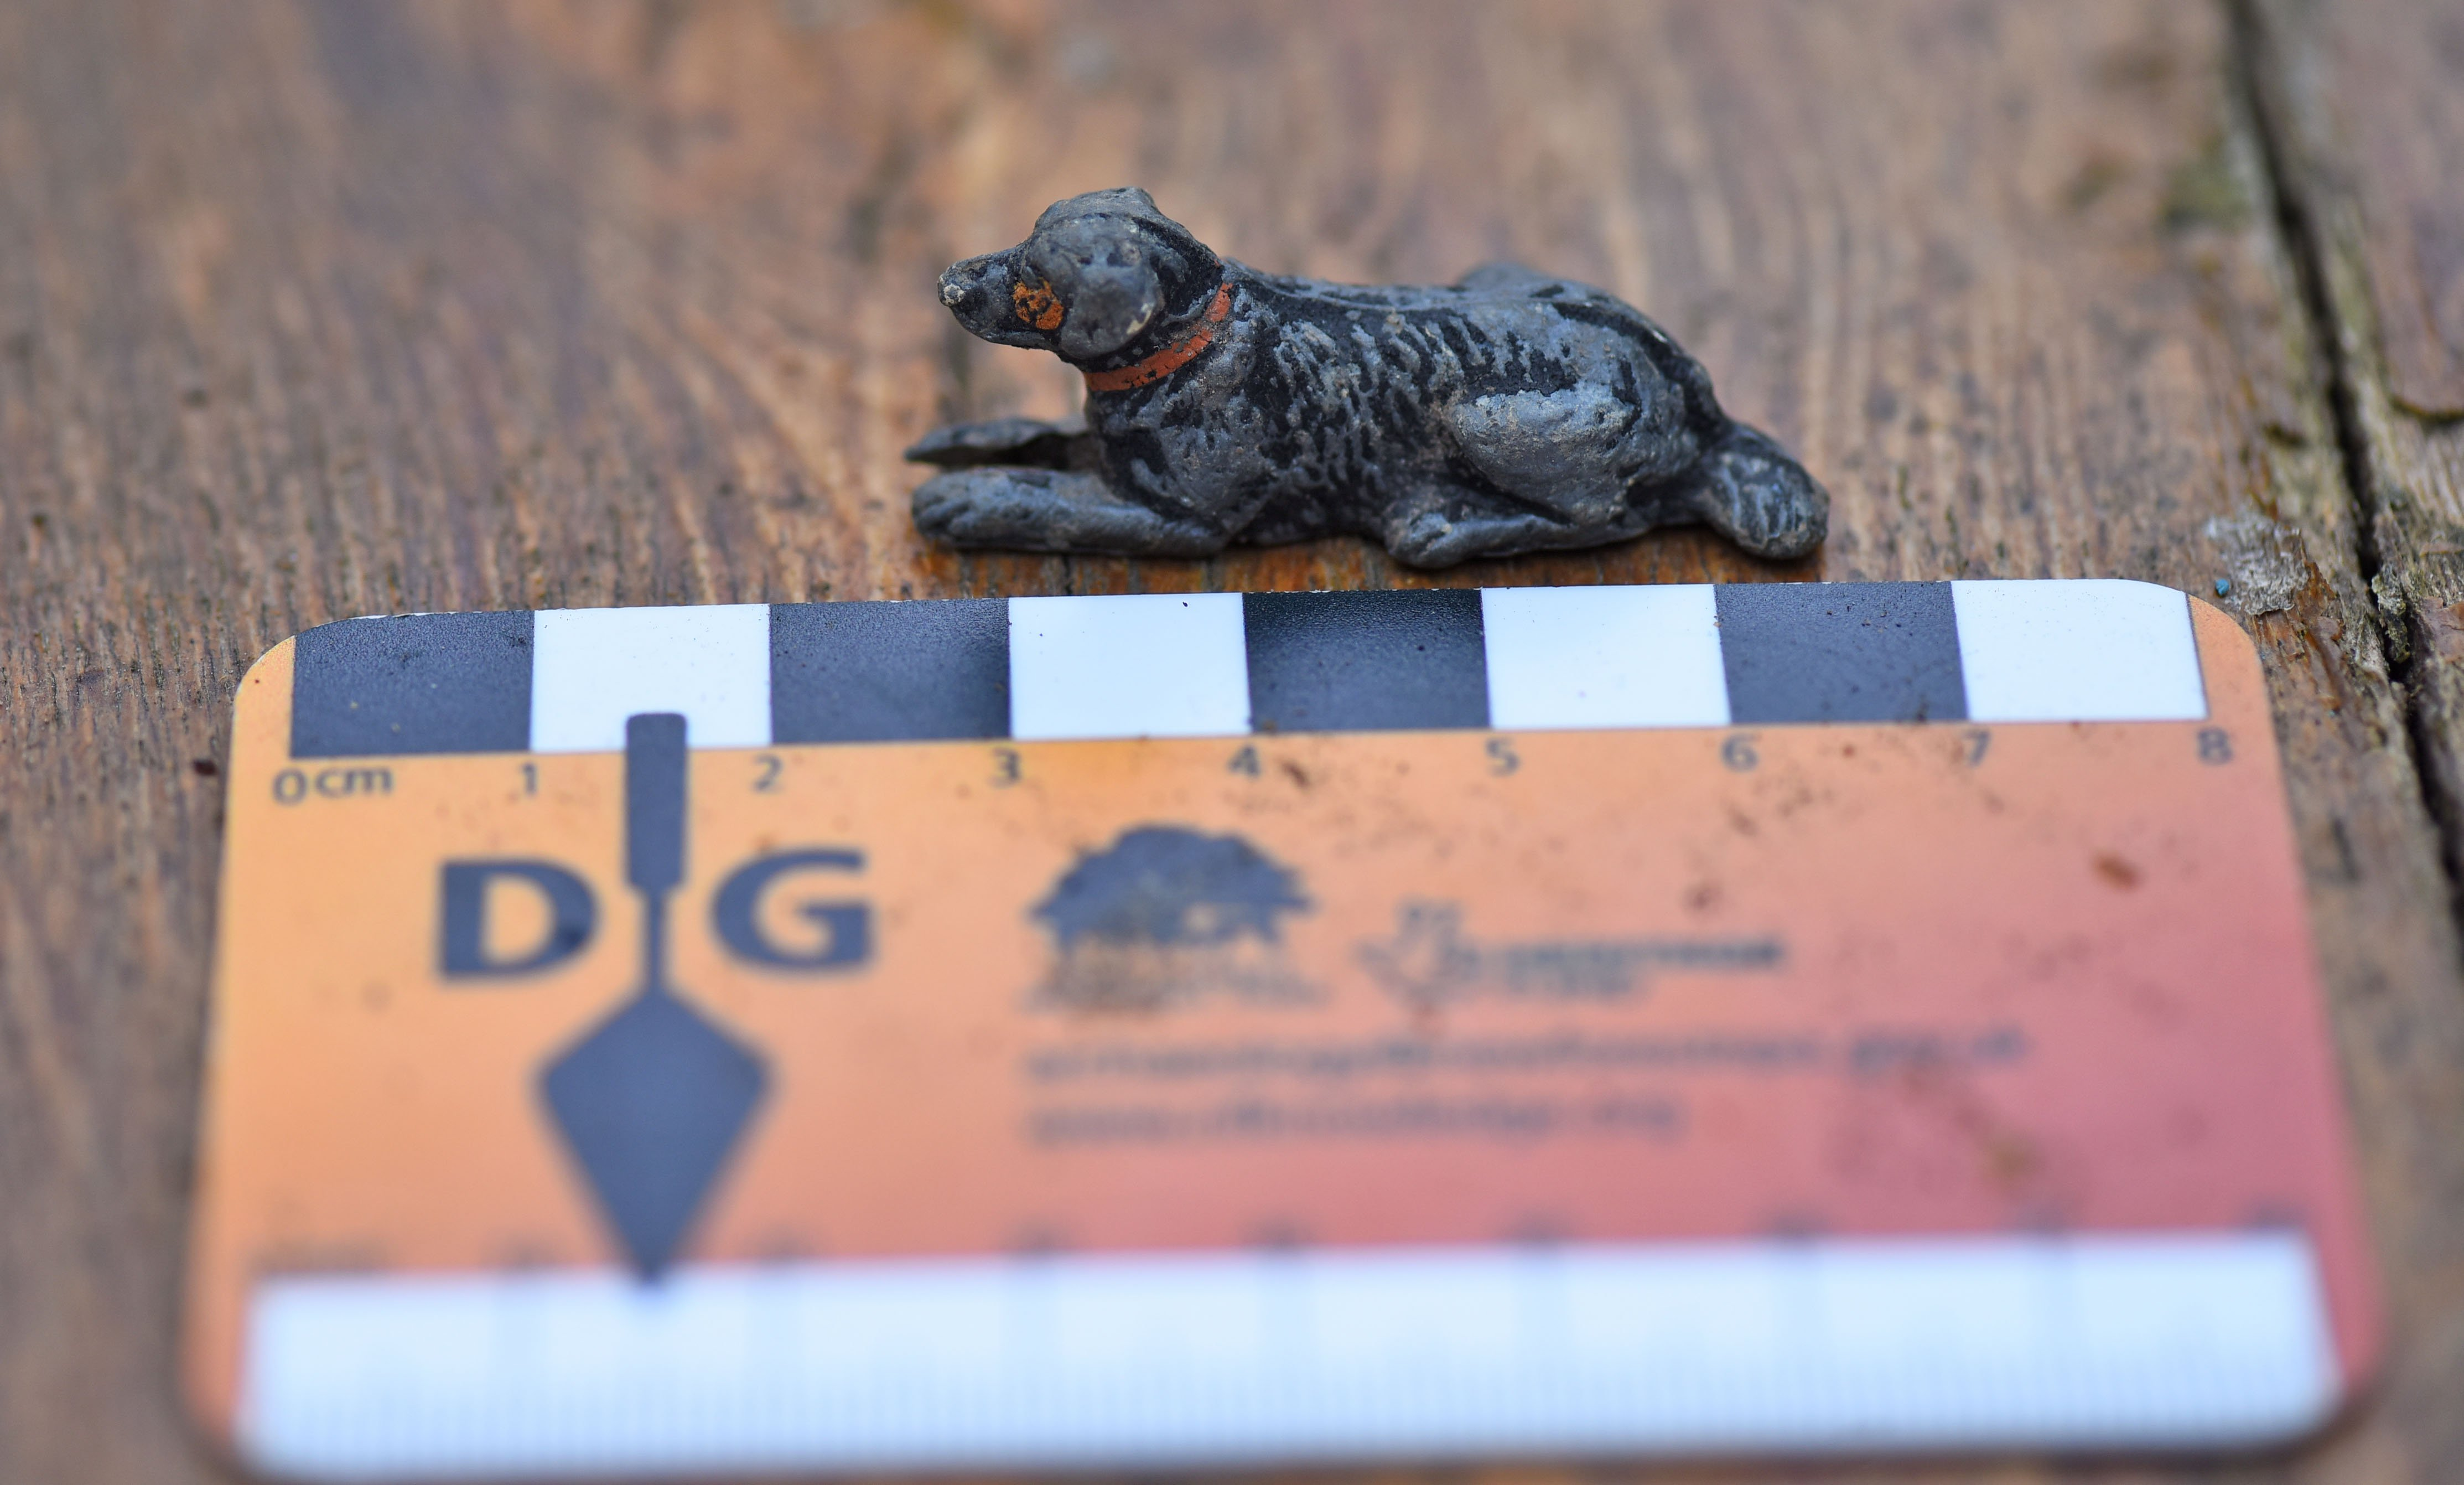 Dig Burley find: small dog